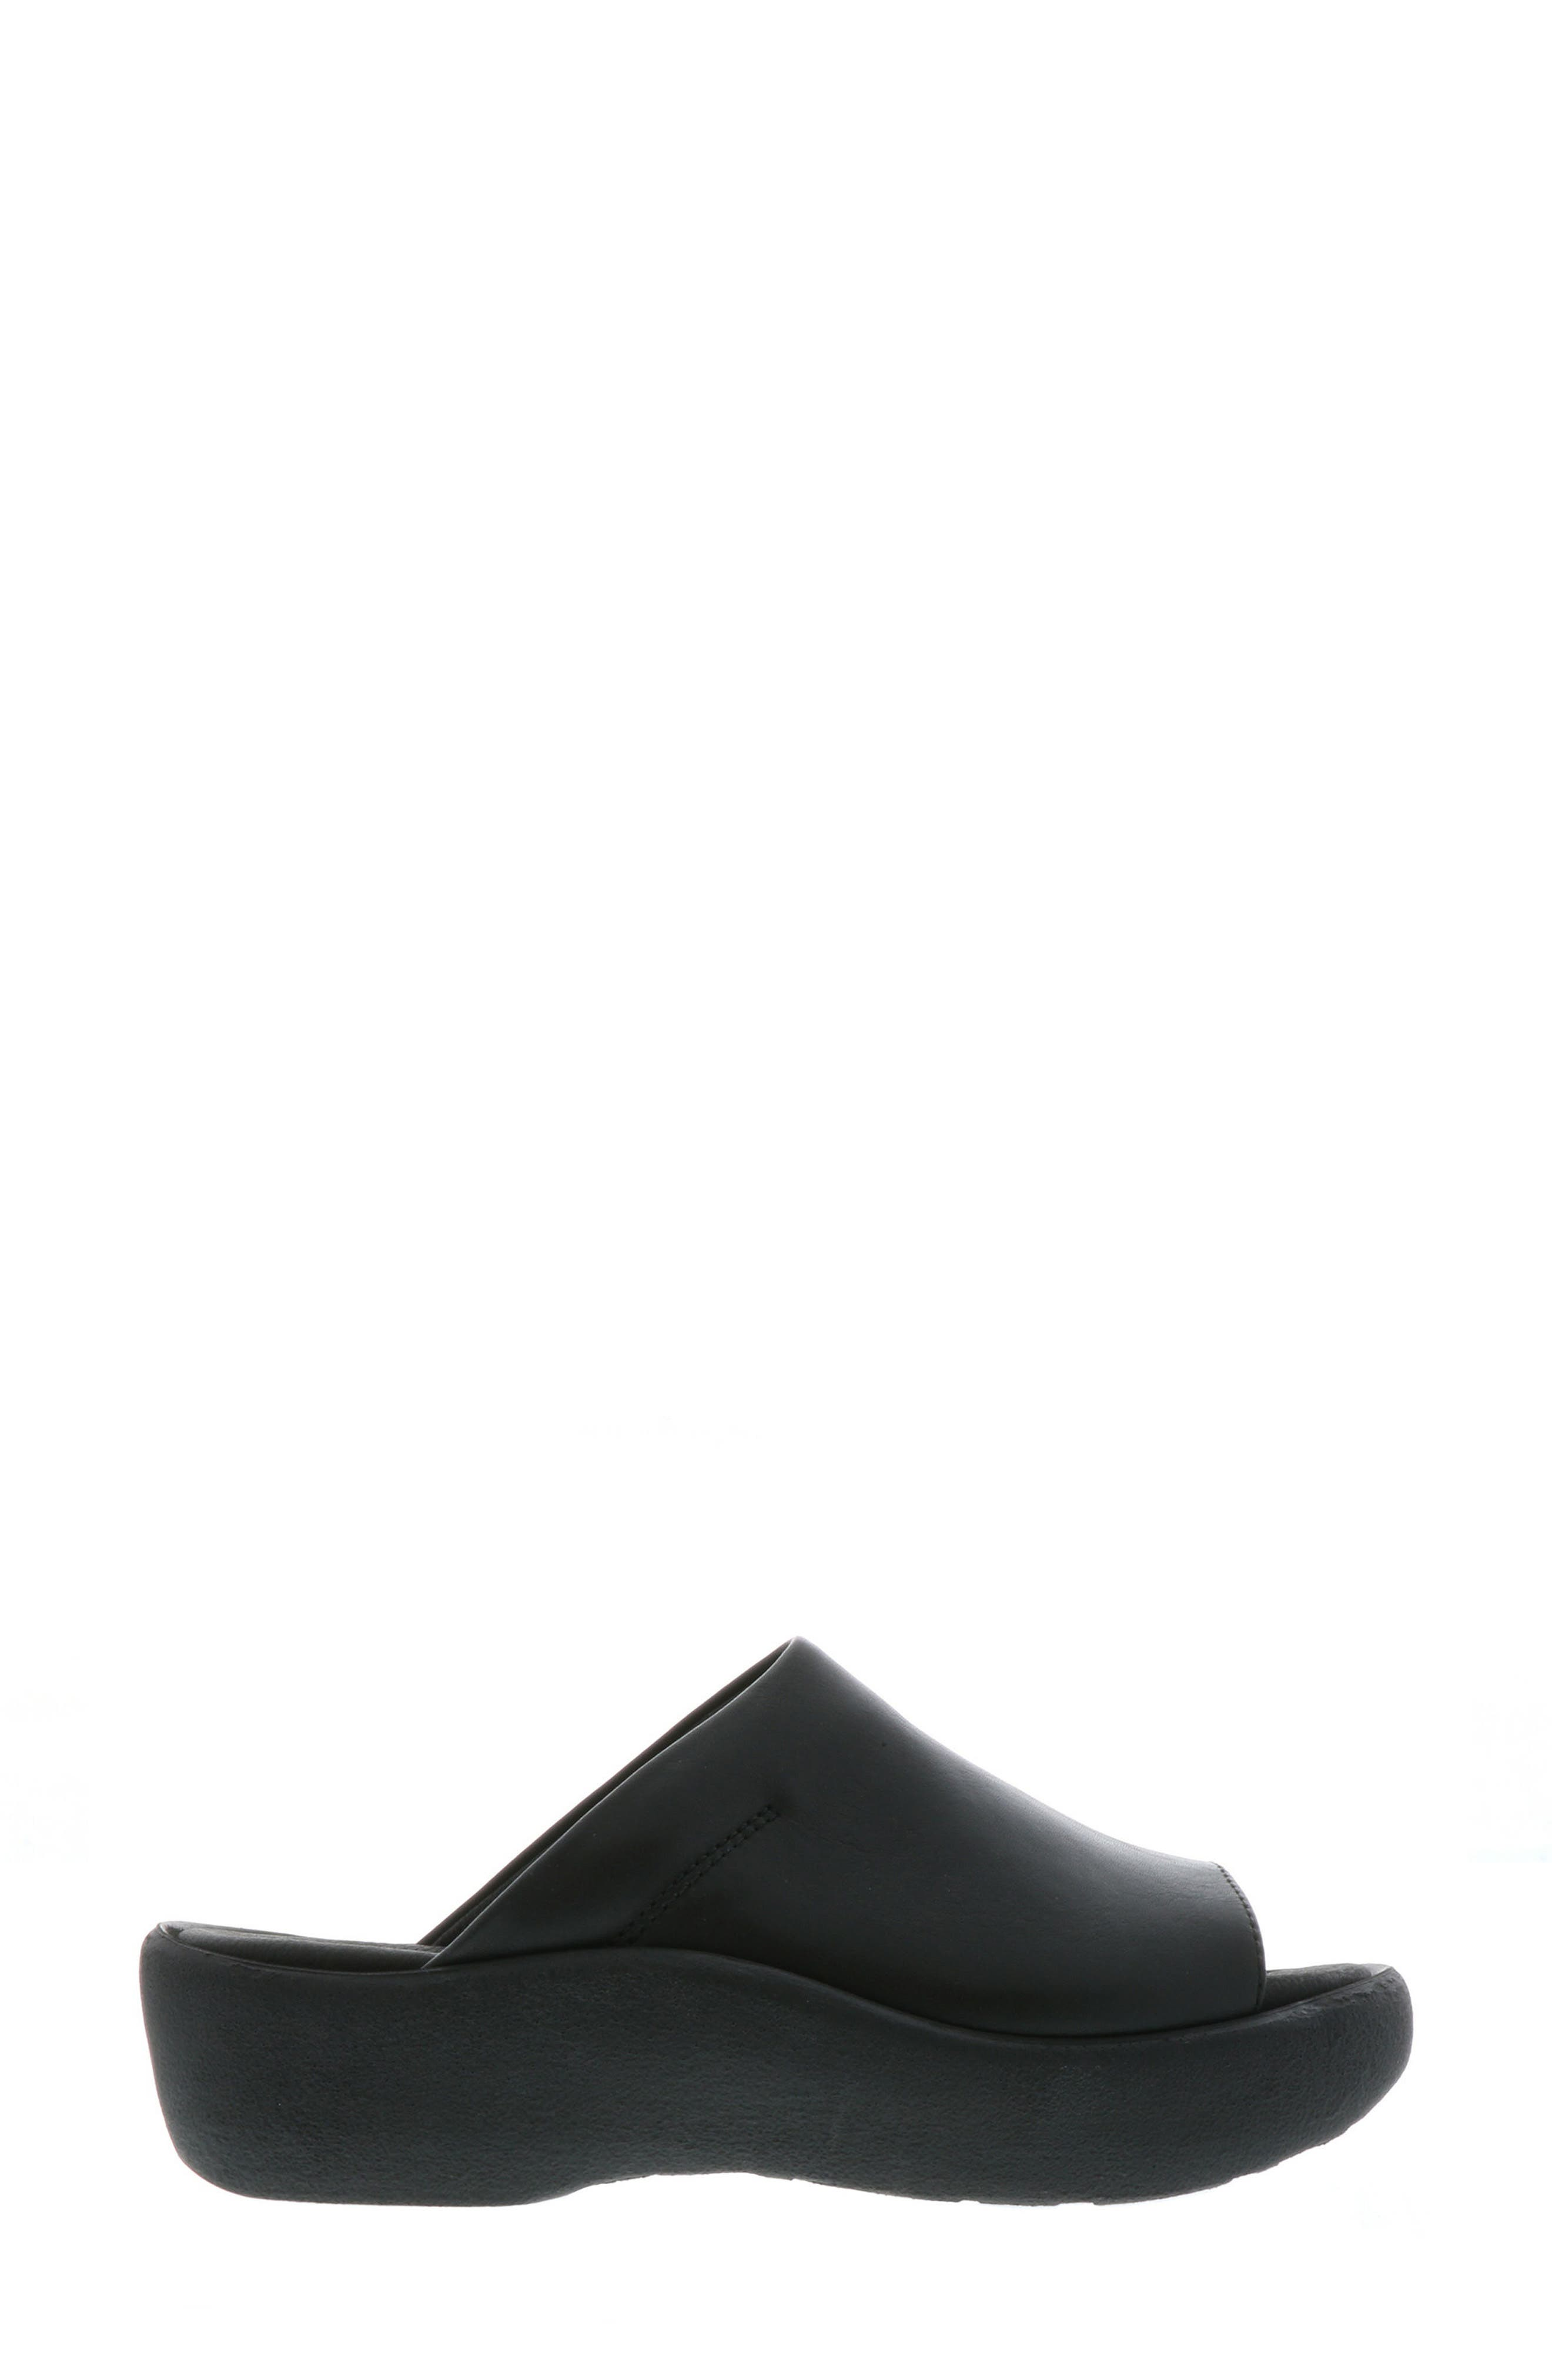 Nassau Slide Sandal,                             Alternate thumbnail 3, color,                             BLACK SMOOTH LEATHER